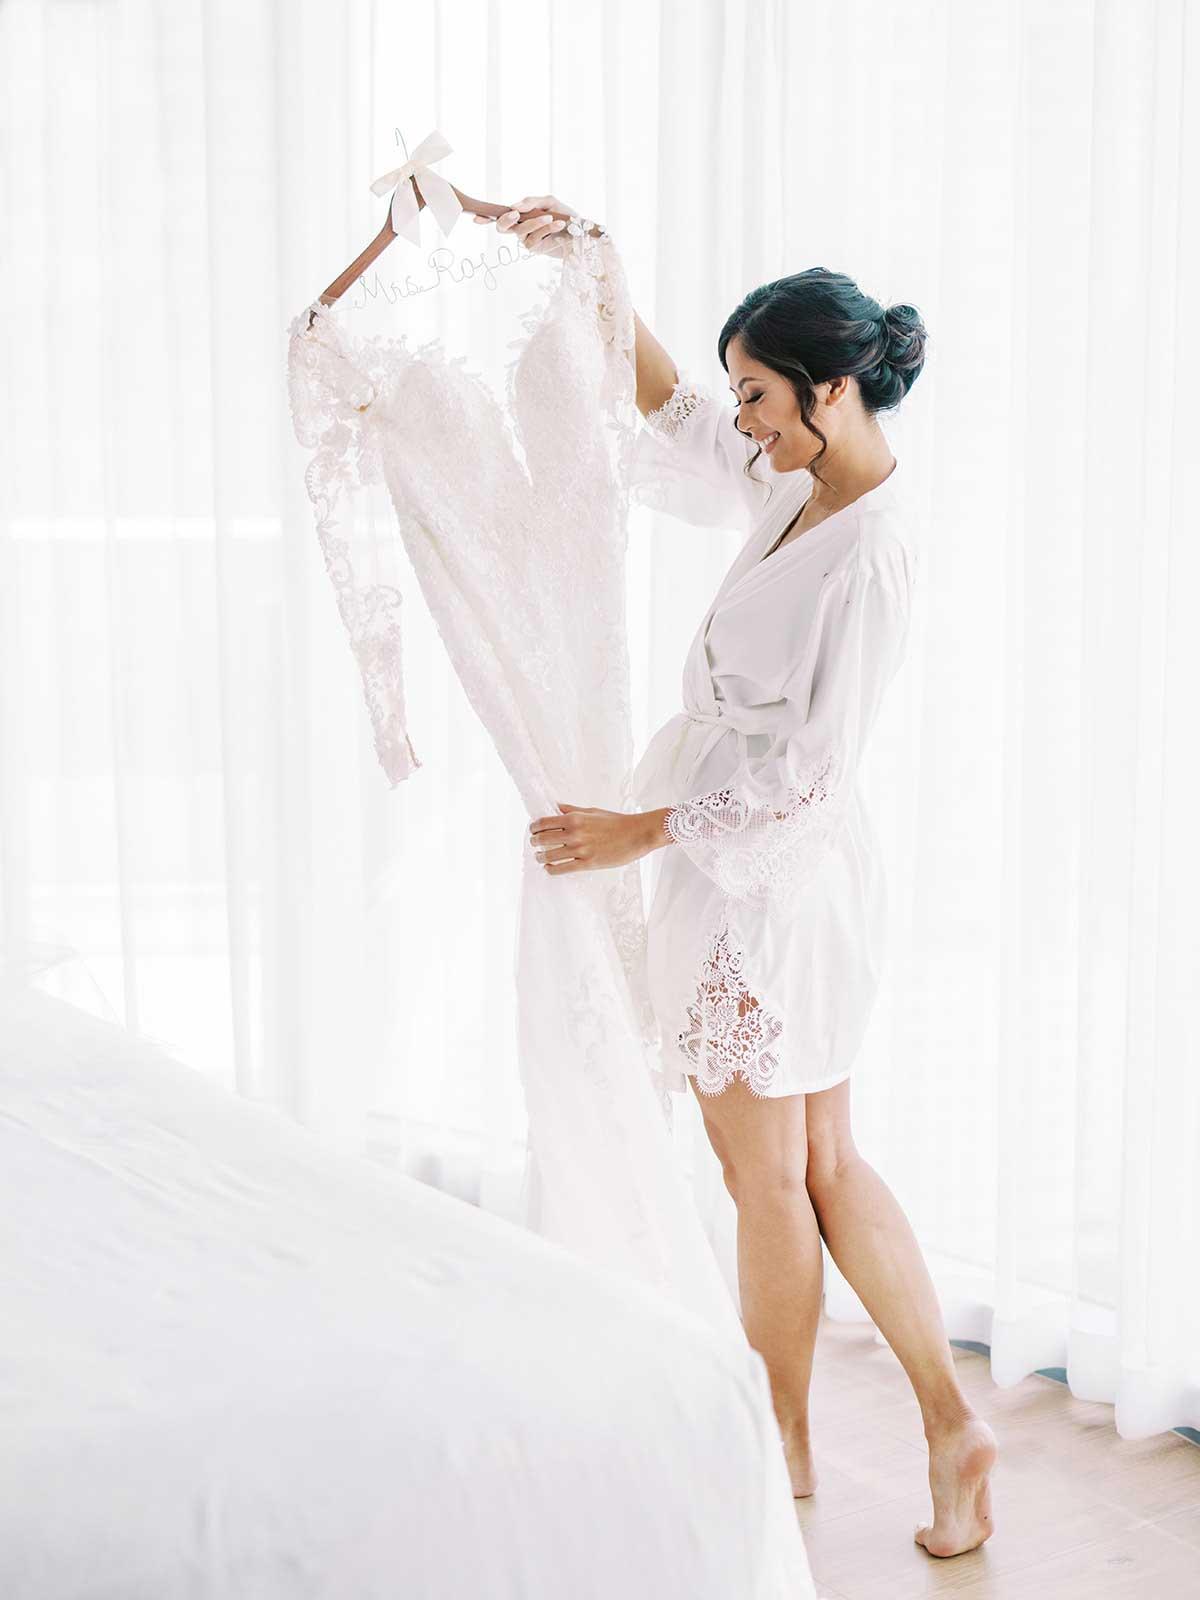 bride admiring her wedding gown wearing her white robe.